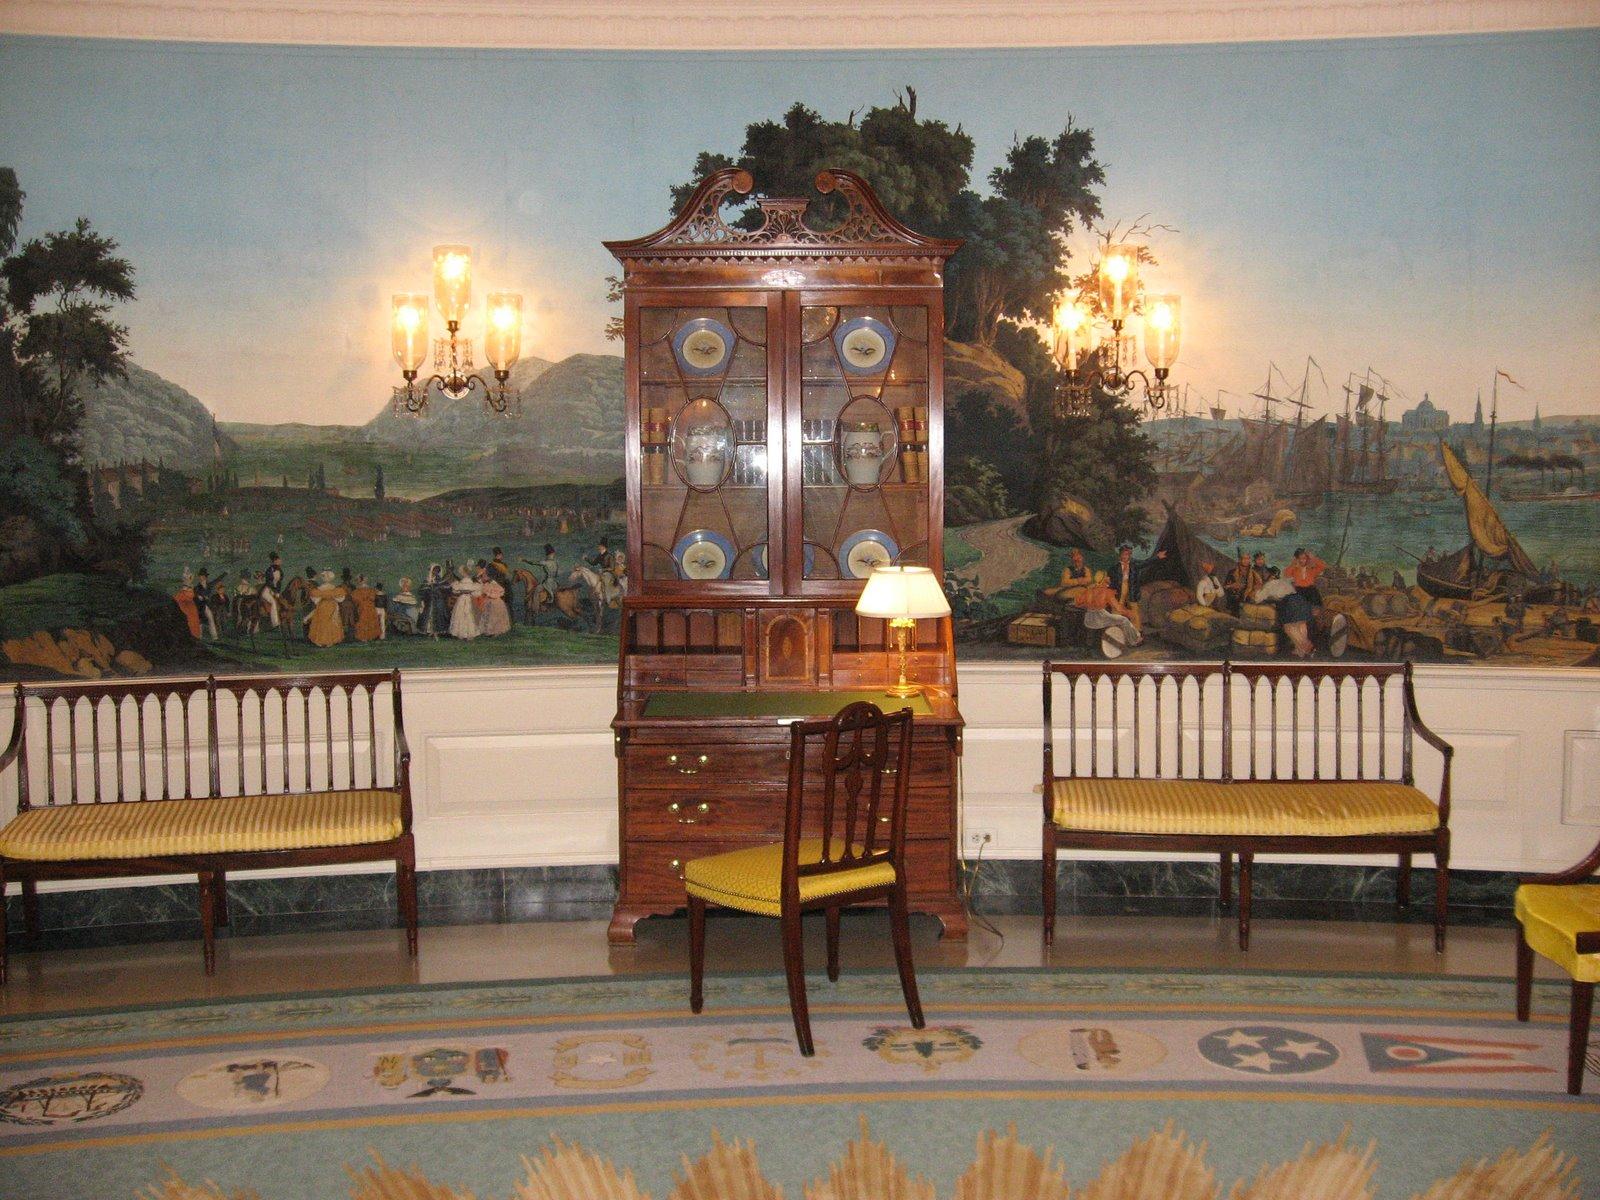 49 zuber scenic wallpaper on wallpapersafari. Black Bedroom Furniture Sets. Home Design Ideas